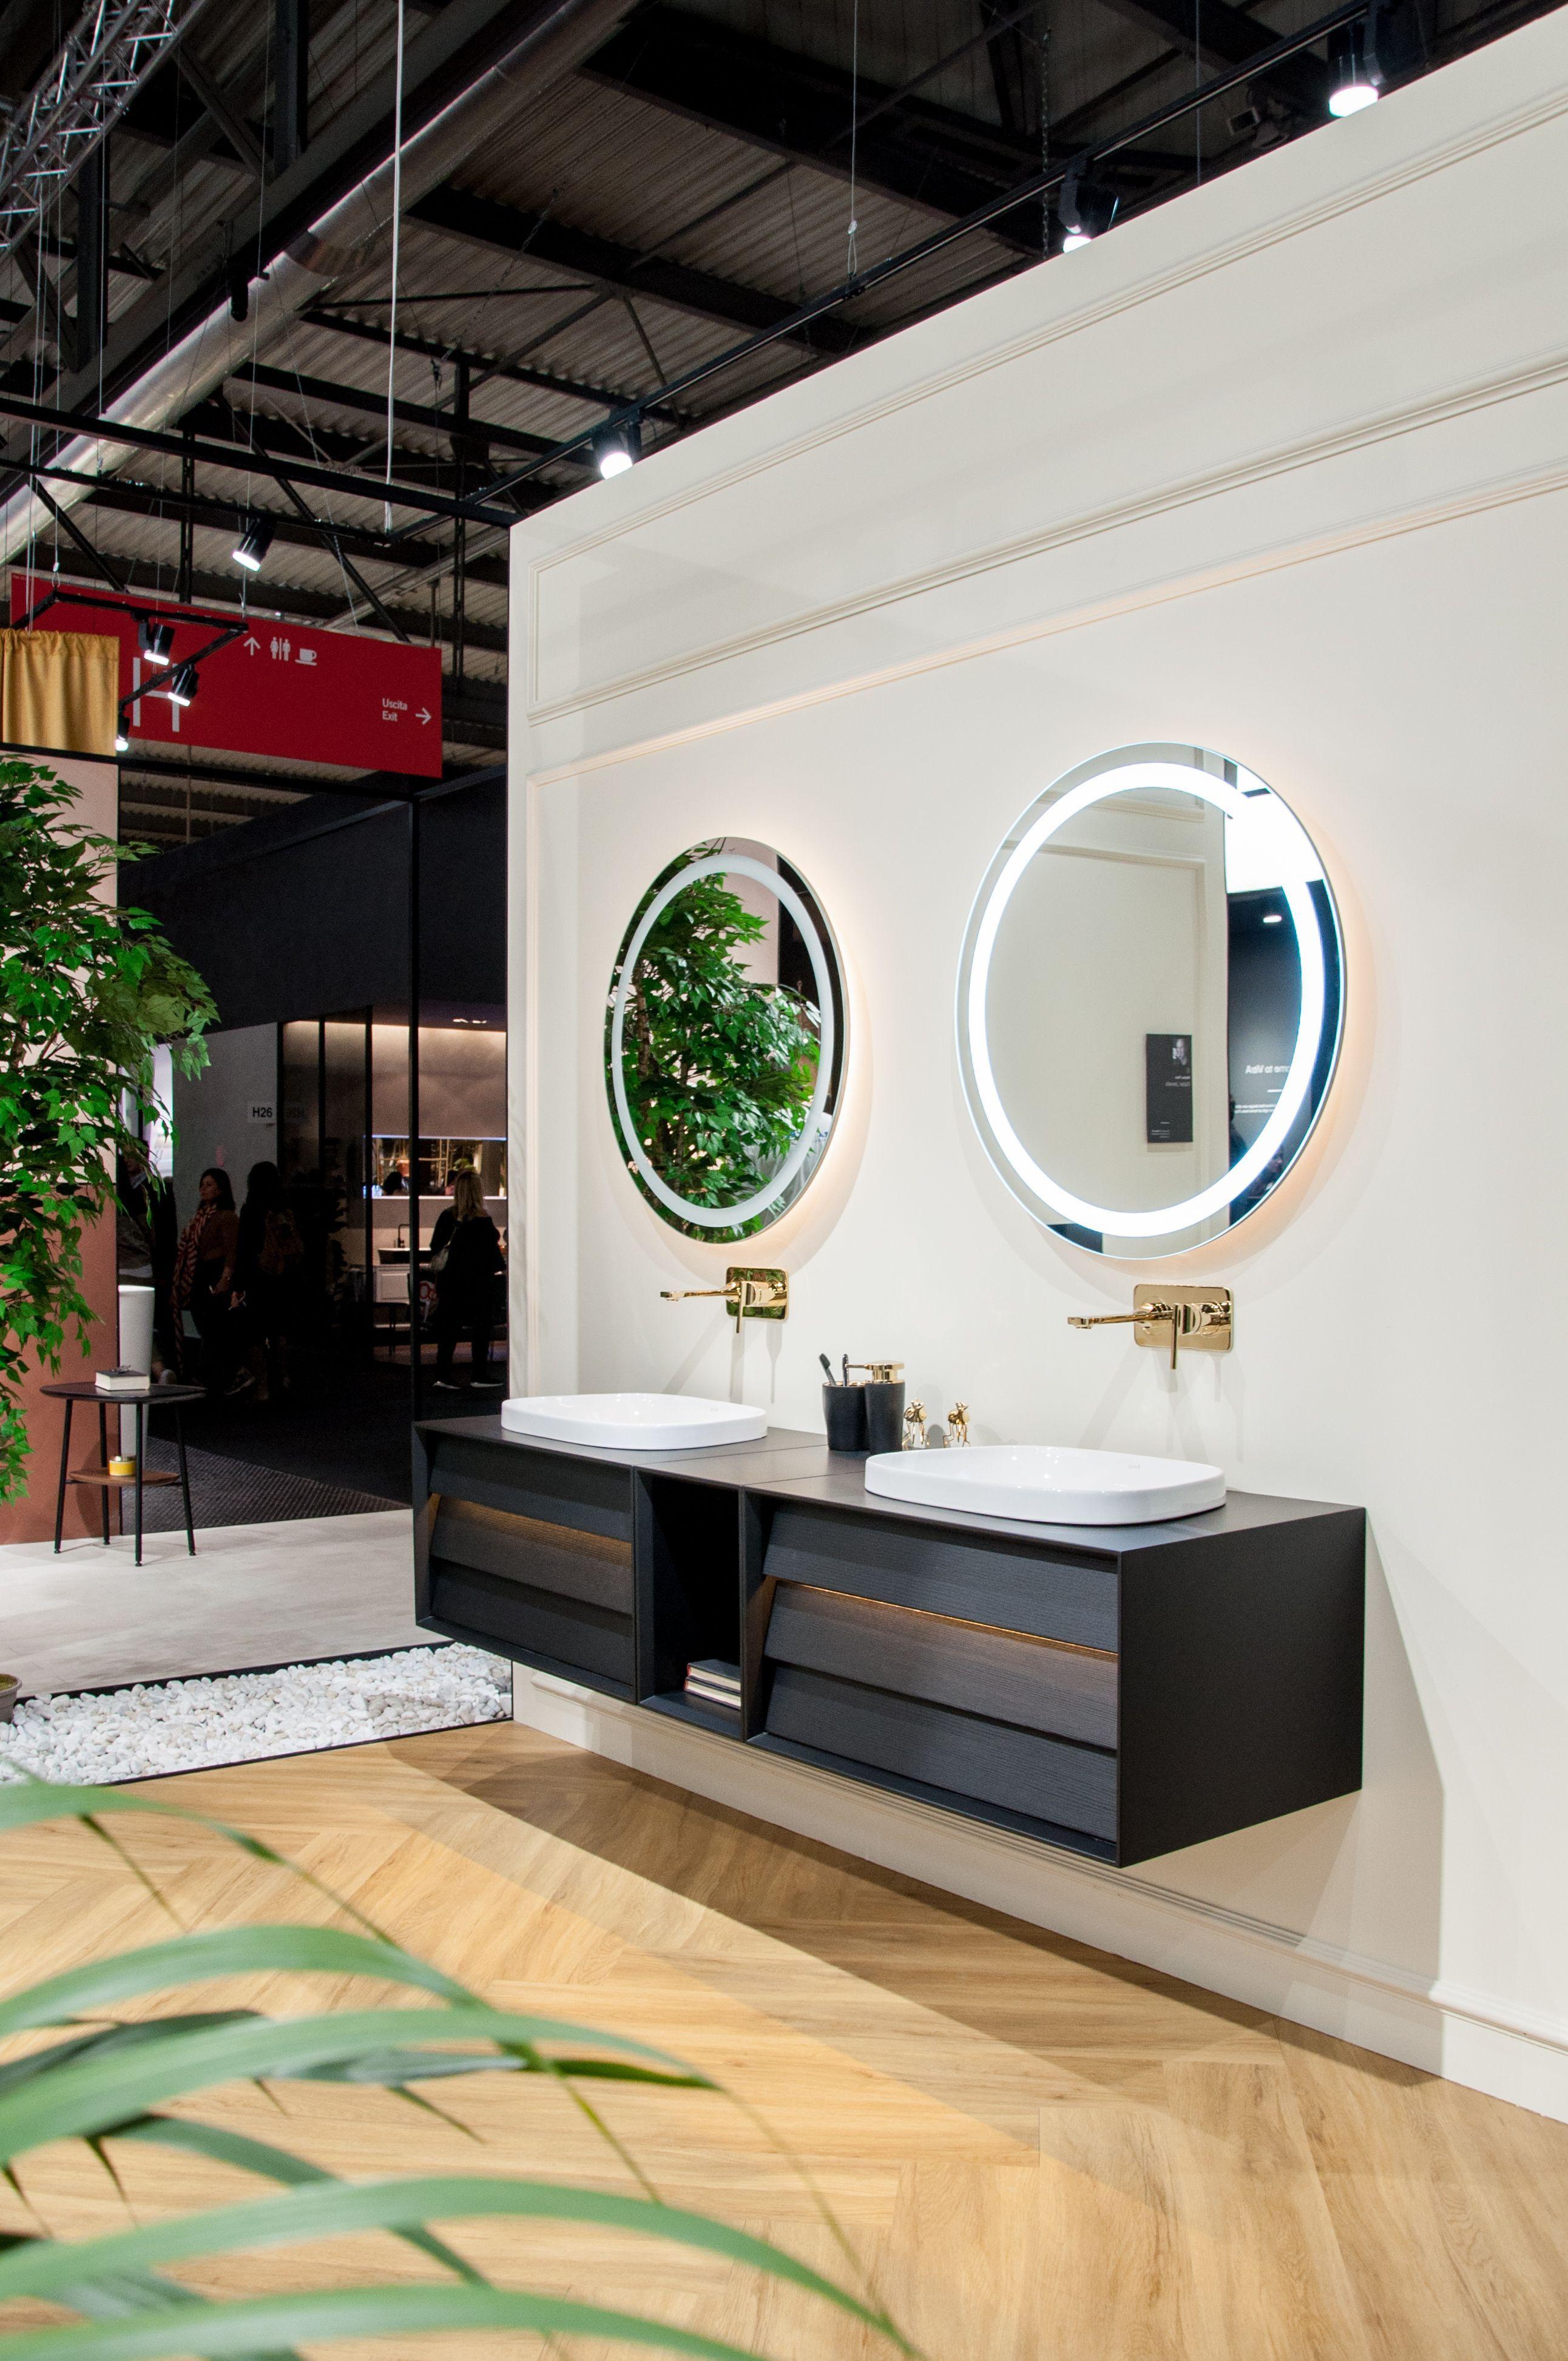 Get To Know All About Salone Del Mobile And The Year Of Leonardo Da Vinci On Mydesignagenda Com Vitra Bathrooms Vitra Showroom Design